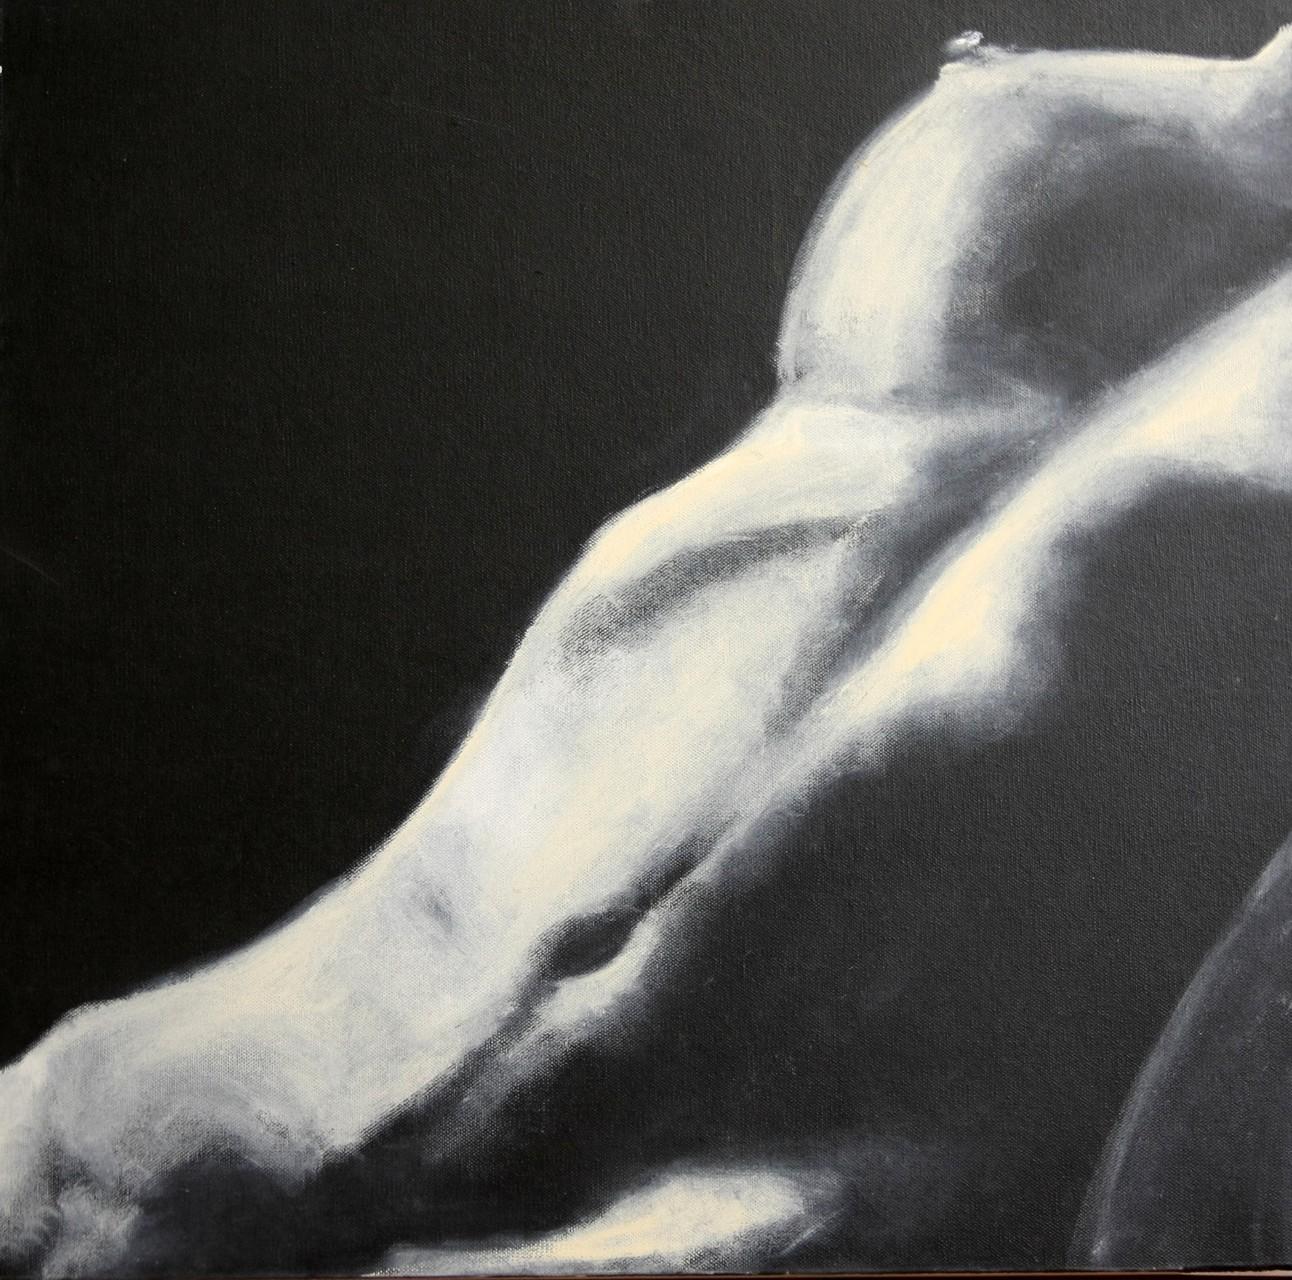 Akt 1 schwarz-weiß  60 x 60 cm